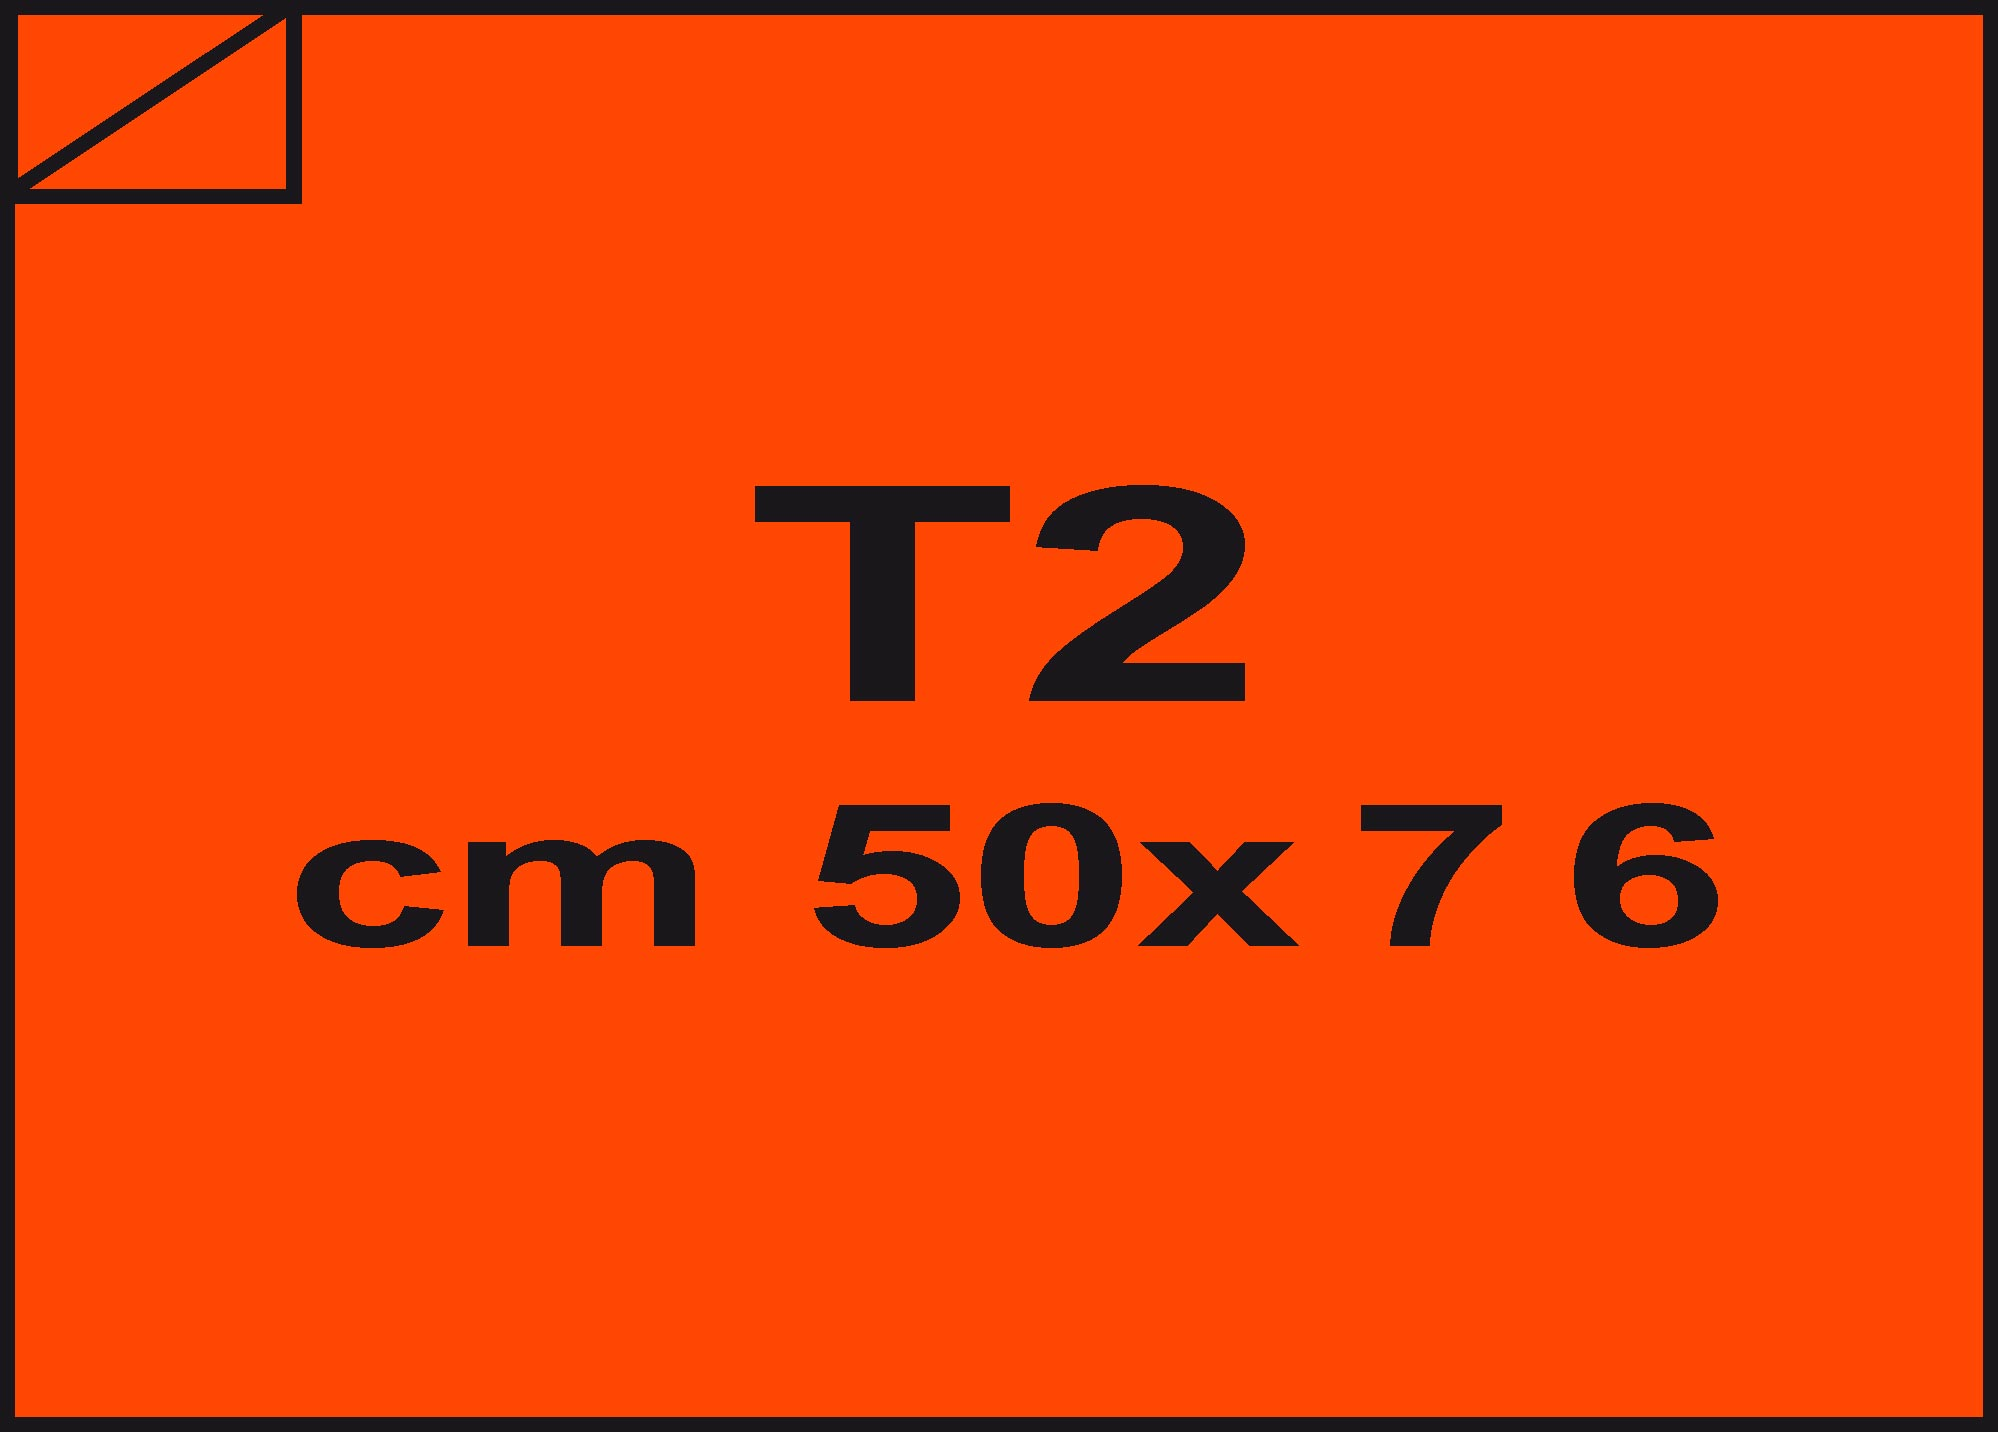 carta Carta velina Arancio 82, formato T2 (50x76cm), 18grammi x mq.